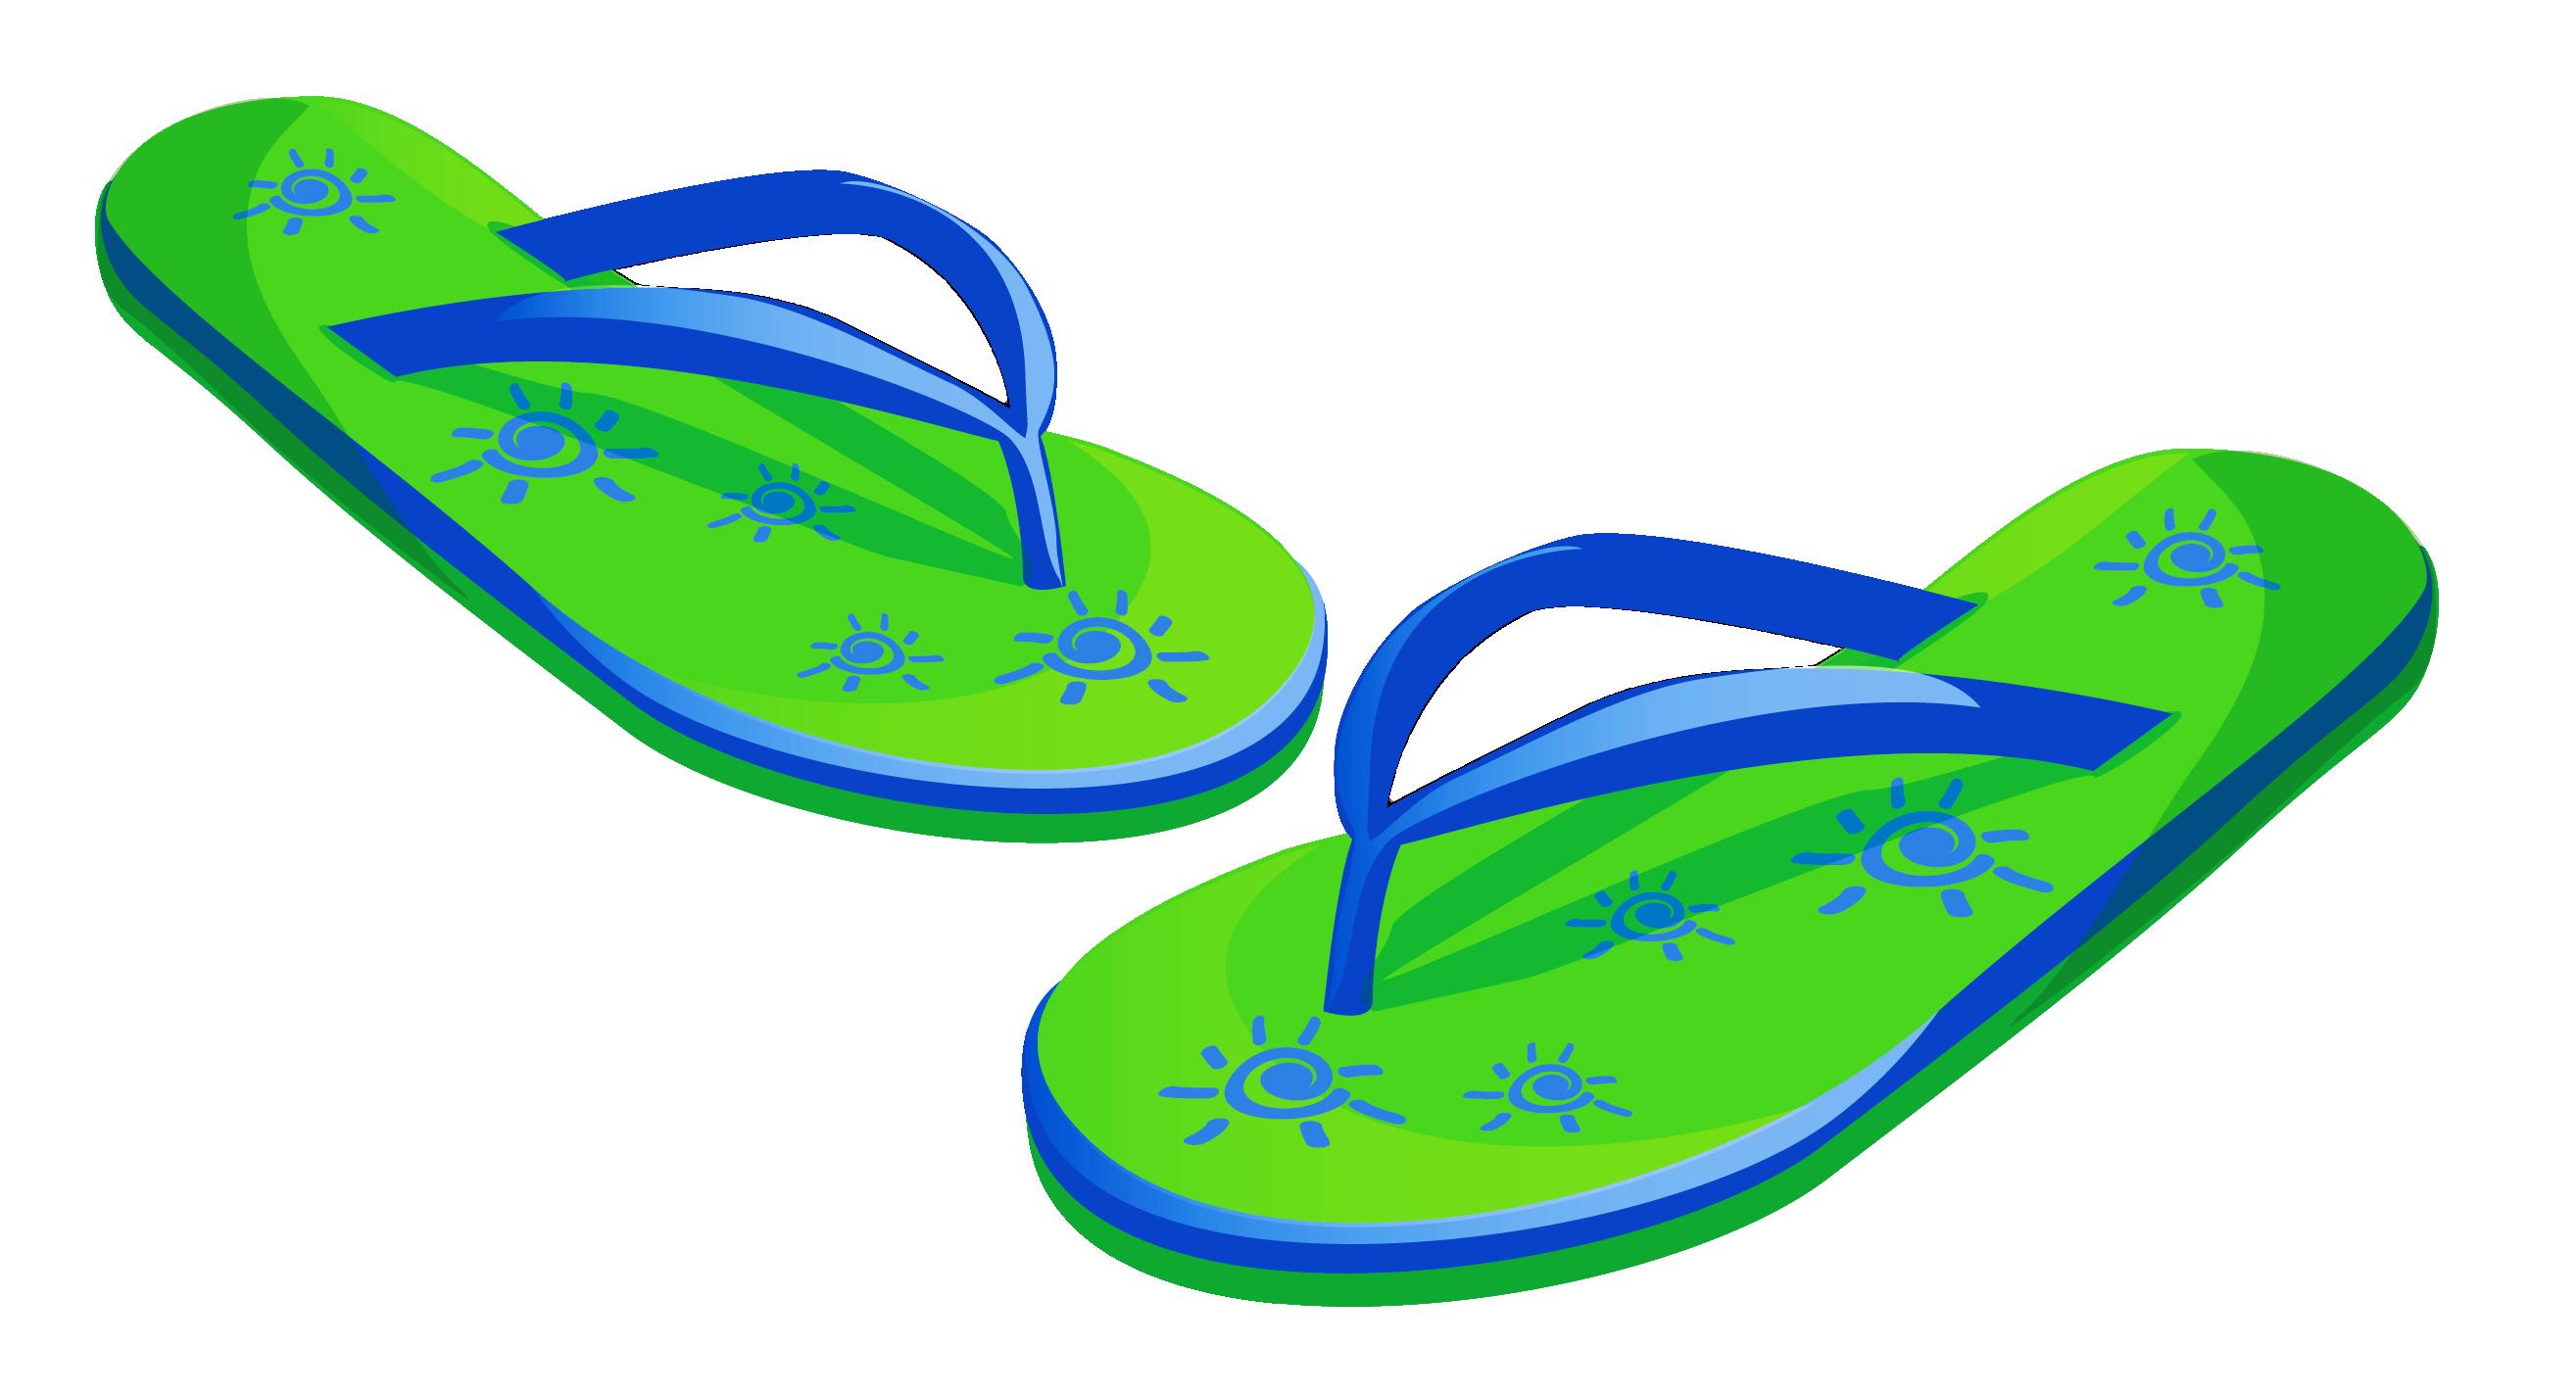 Flip flop clipart free jpg download Transparent Green Beach Flip Flops PNG Clipart | Gallery ... jpg download